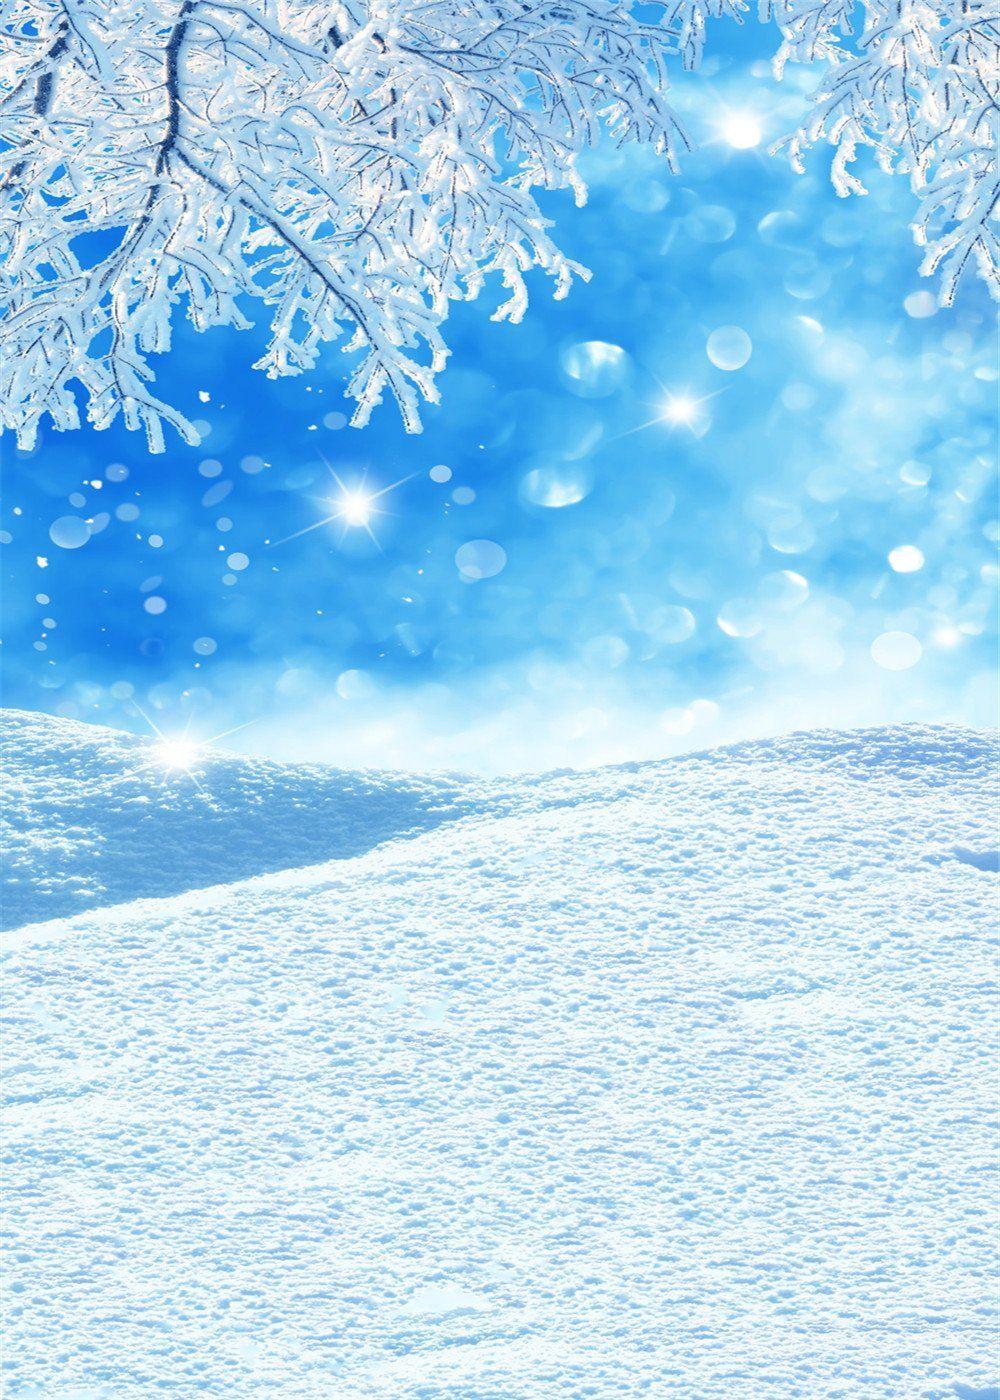 5 x 7ft 150x210cm kate invierno photography azul cielo for Blanco nieve